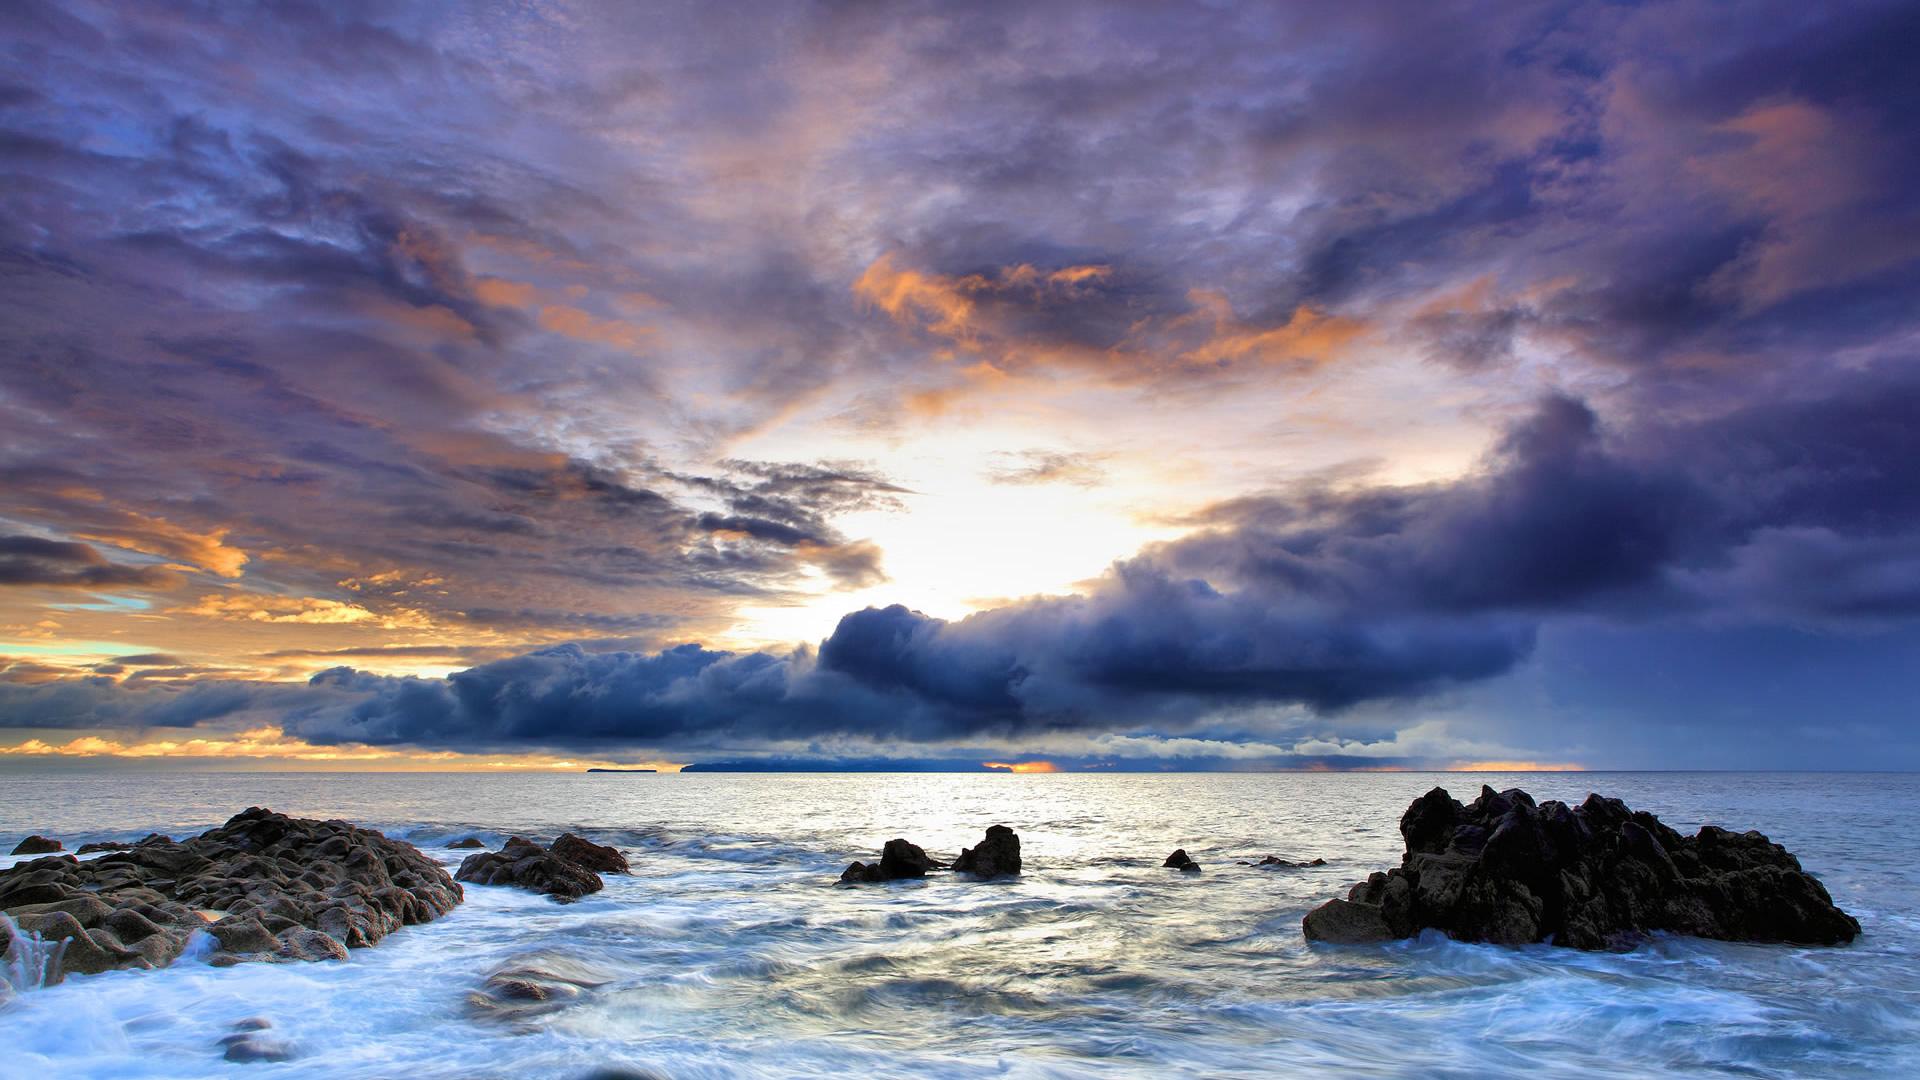 Ocean Scenery Wallpaper 3